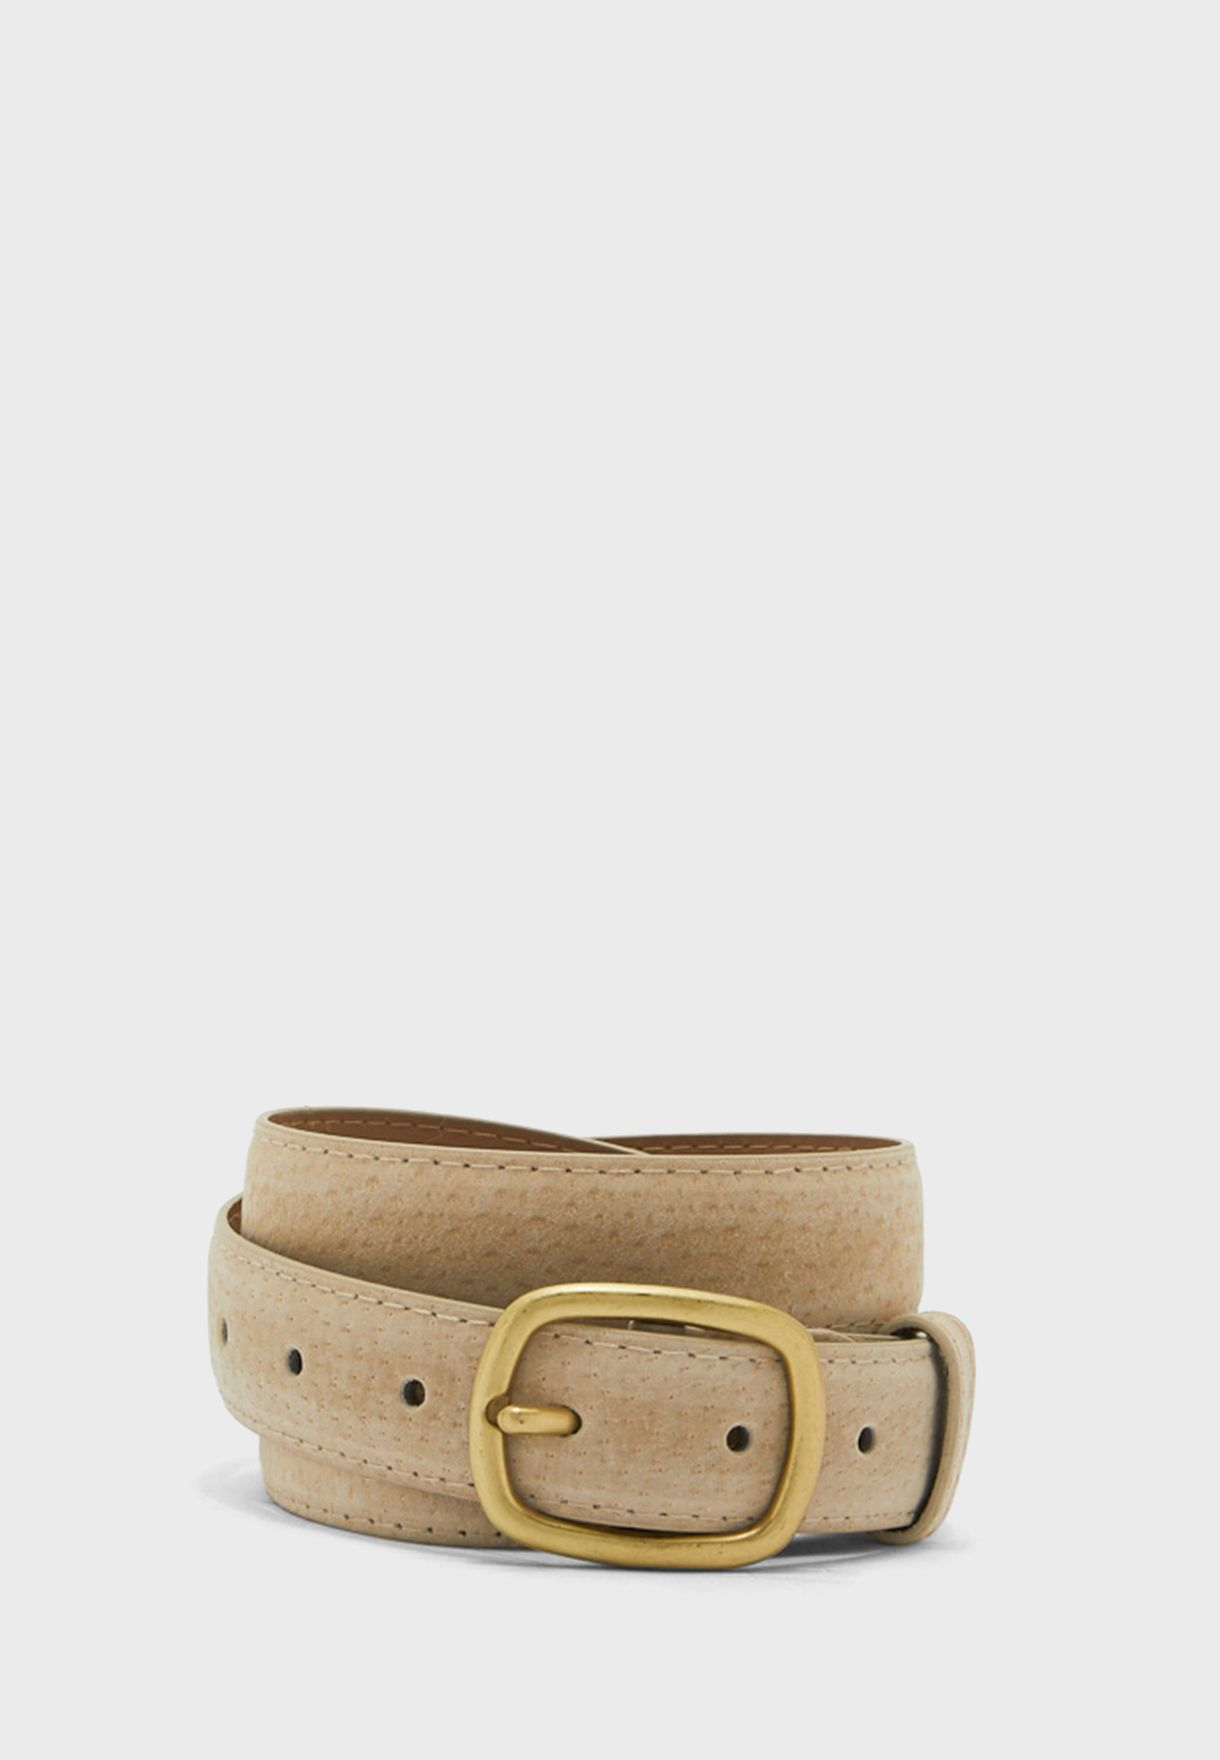 Leather Oblong Buckle Belt